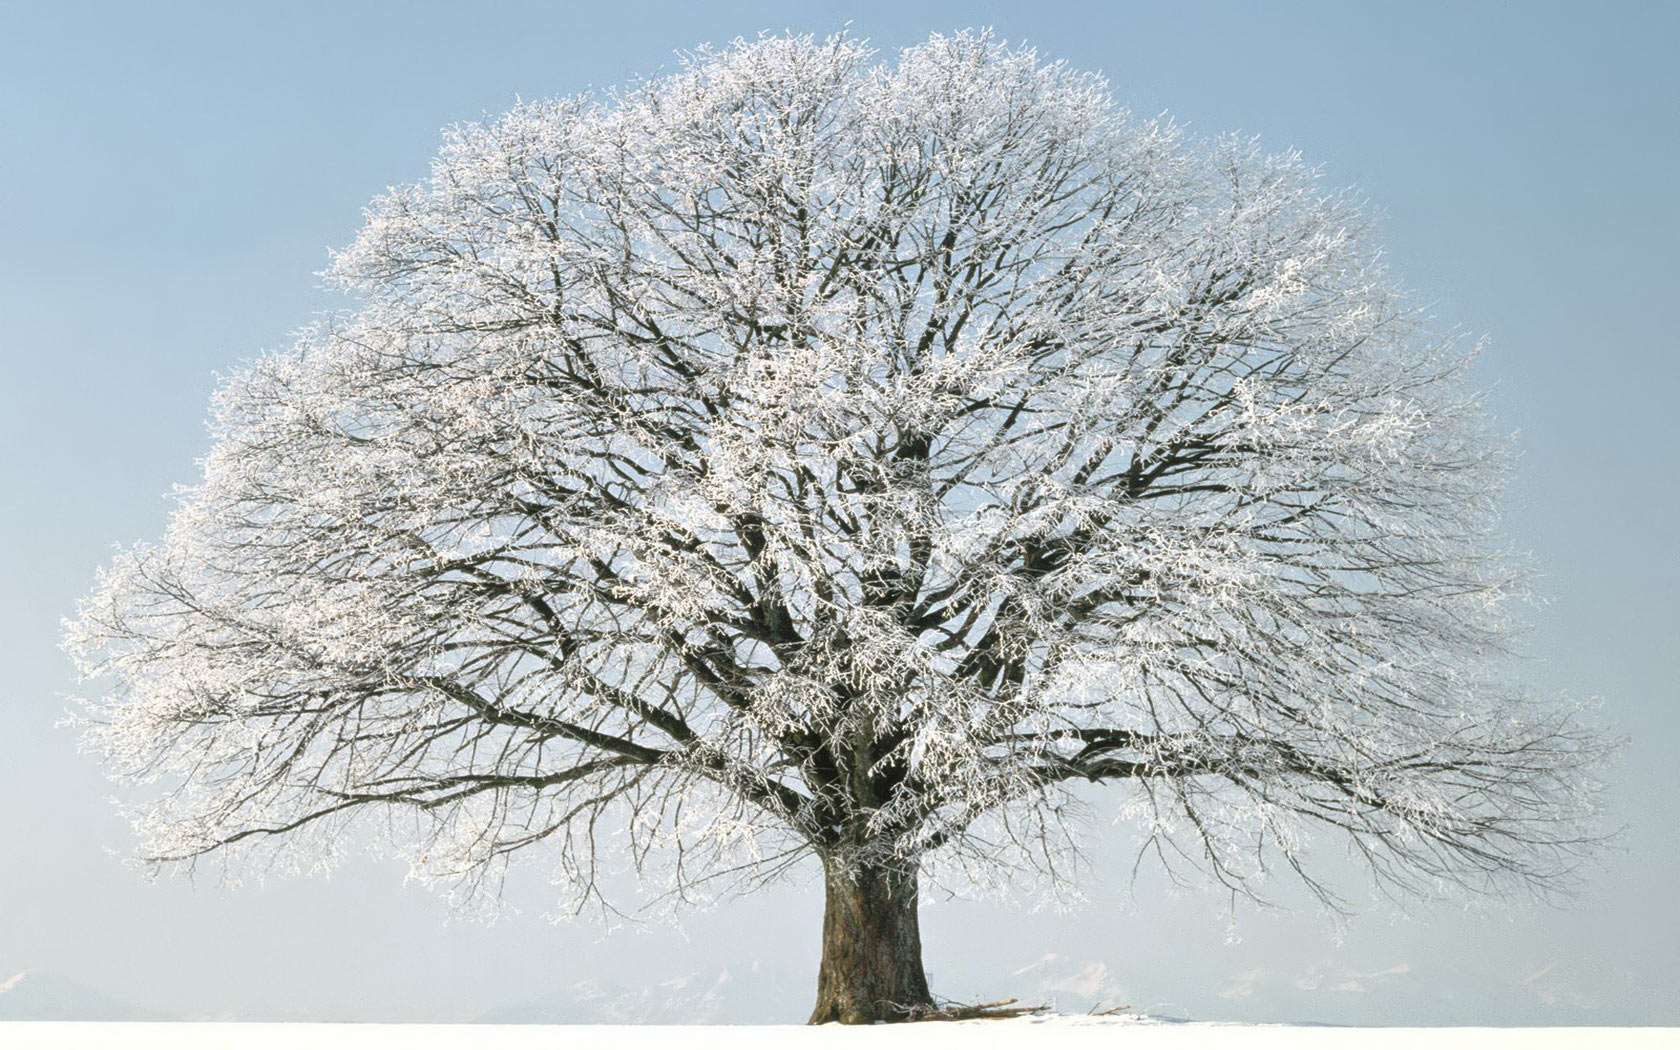 Winter Snow Wallpaper 16801050 Winter Snow 1680x1050